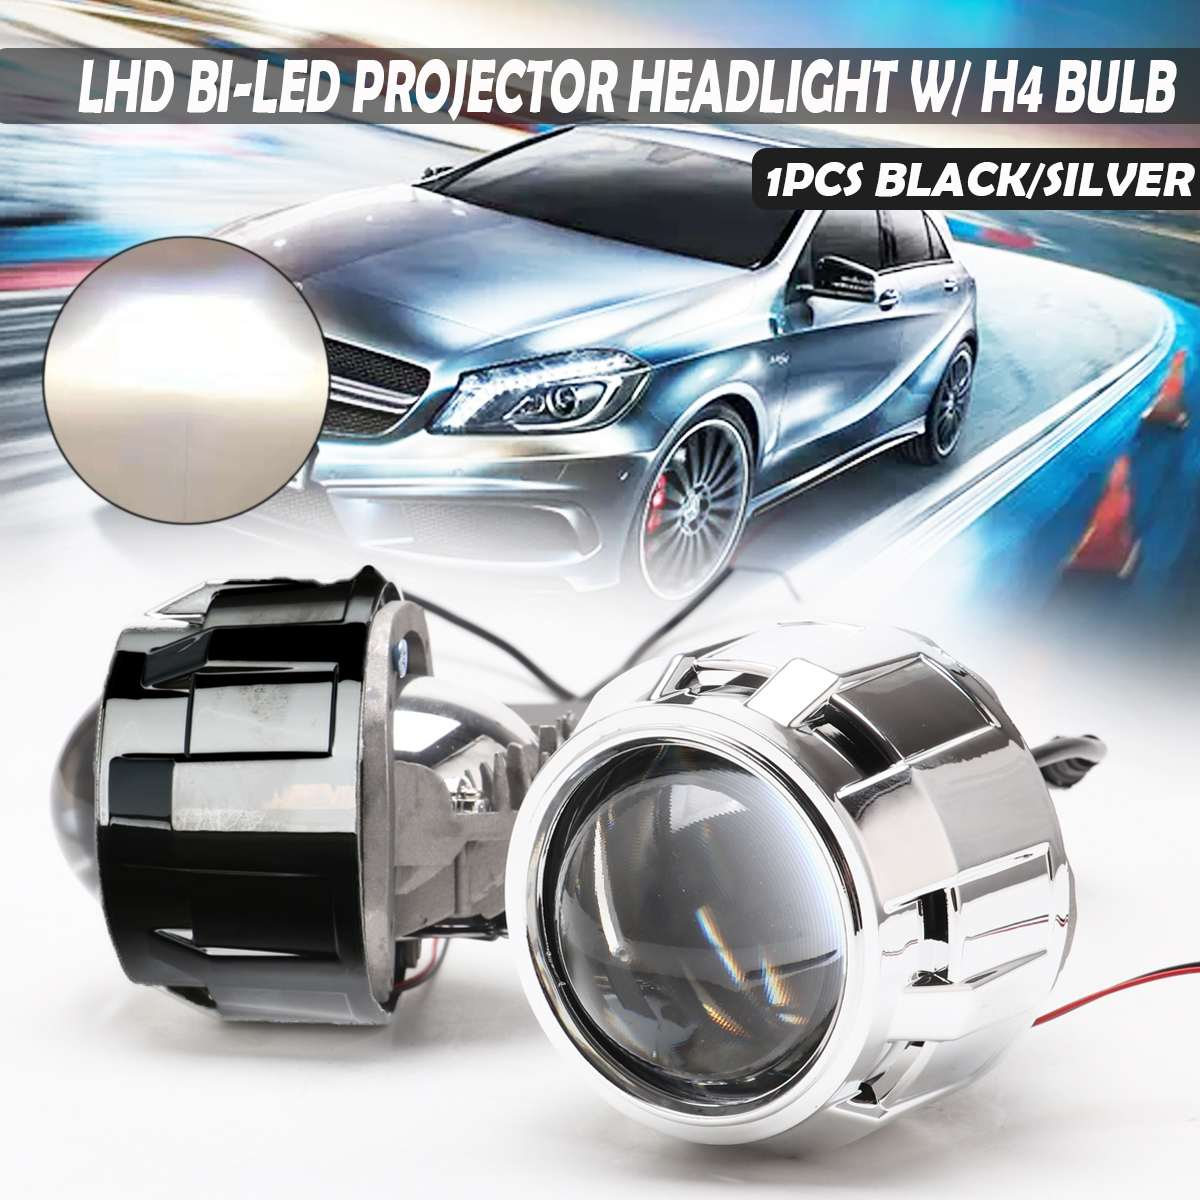 Mofaner LHD 2.5'' Bi-LED Projector Lens Headlight For Auto Car Headlight Retrofit H4 LED Car Styling Headlamp Tuning Retrofit